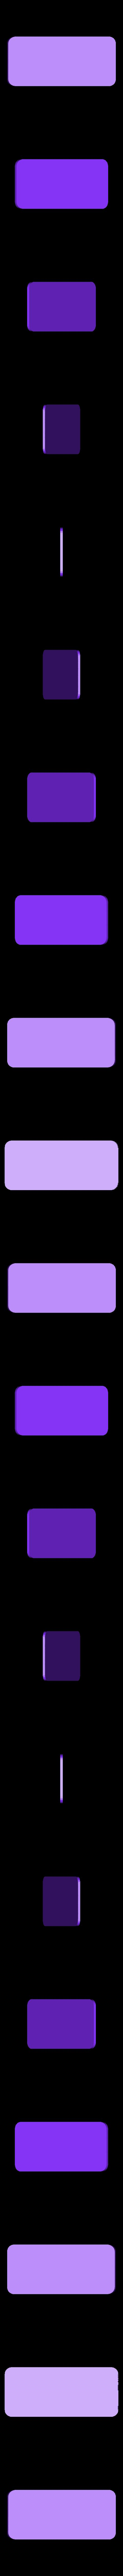 fondstoppub.obj Download free OBJ file Stop ads in the mailbox • 3D printer design, Gogorian